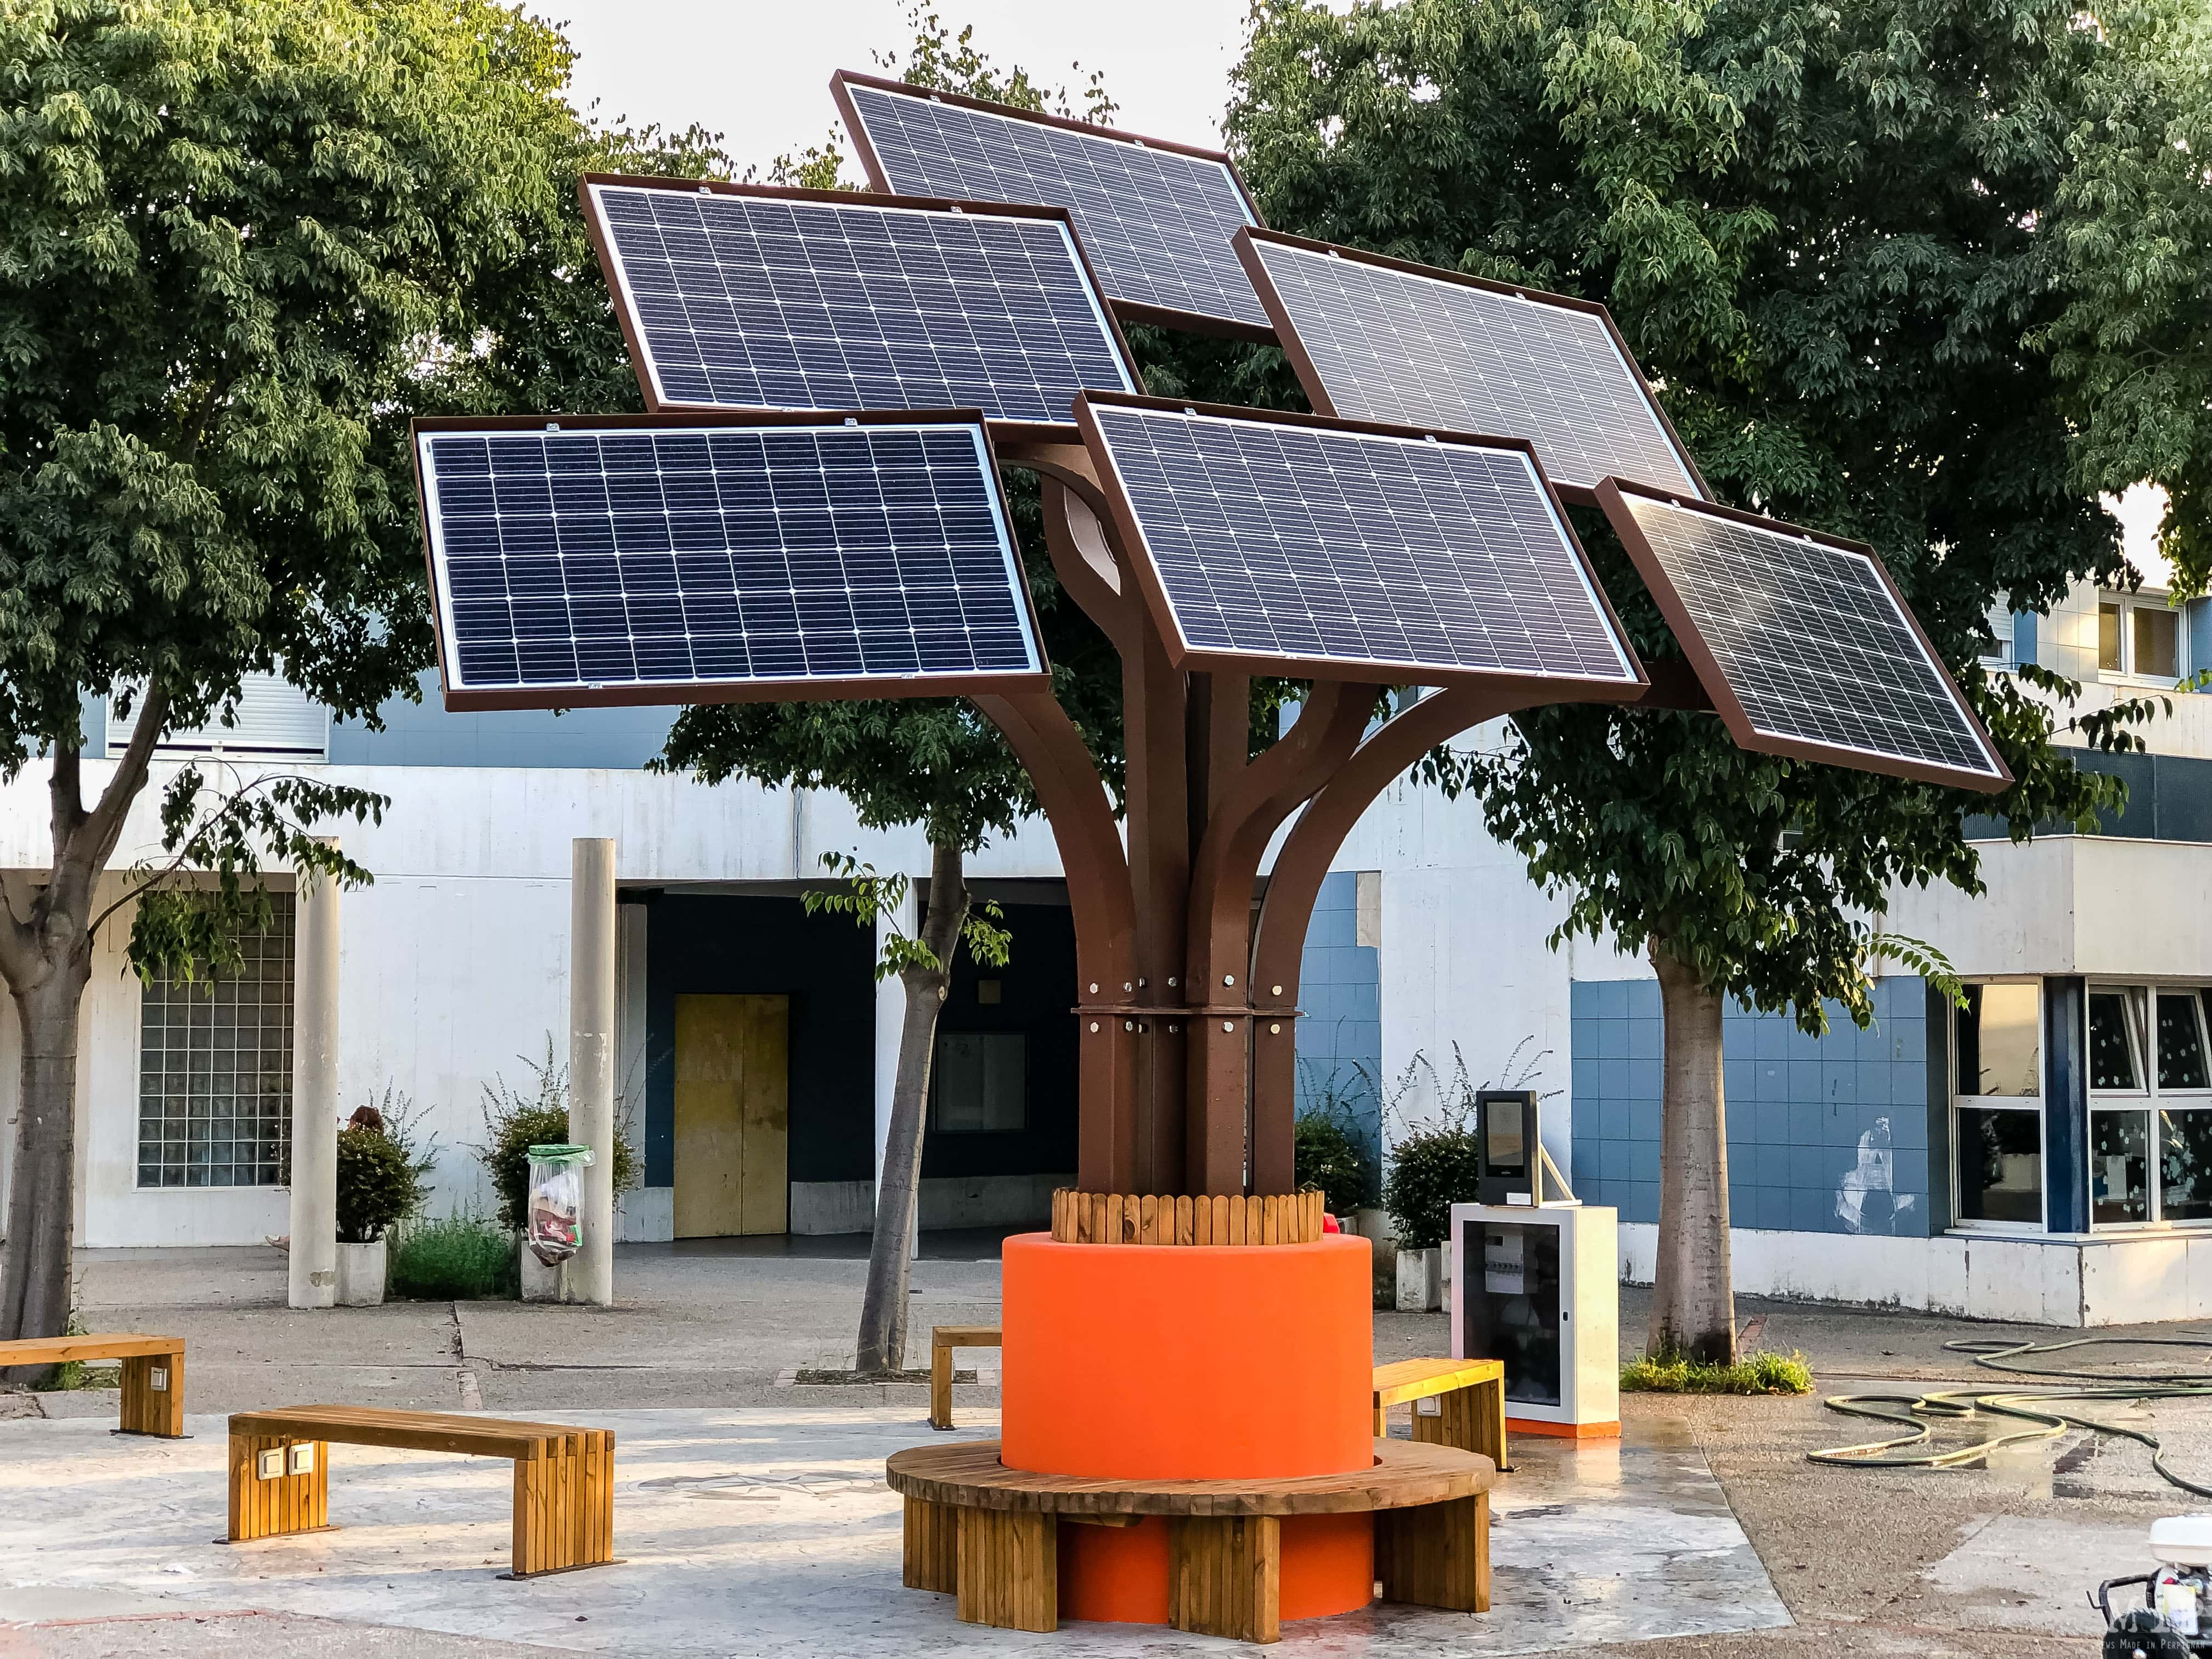 Elio's arbre solaire UPVD photovoltaïque